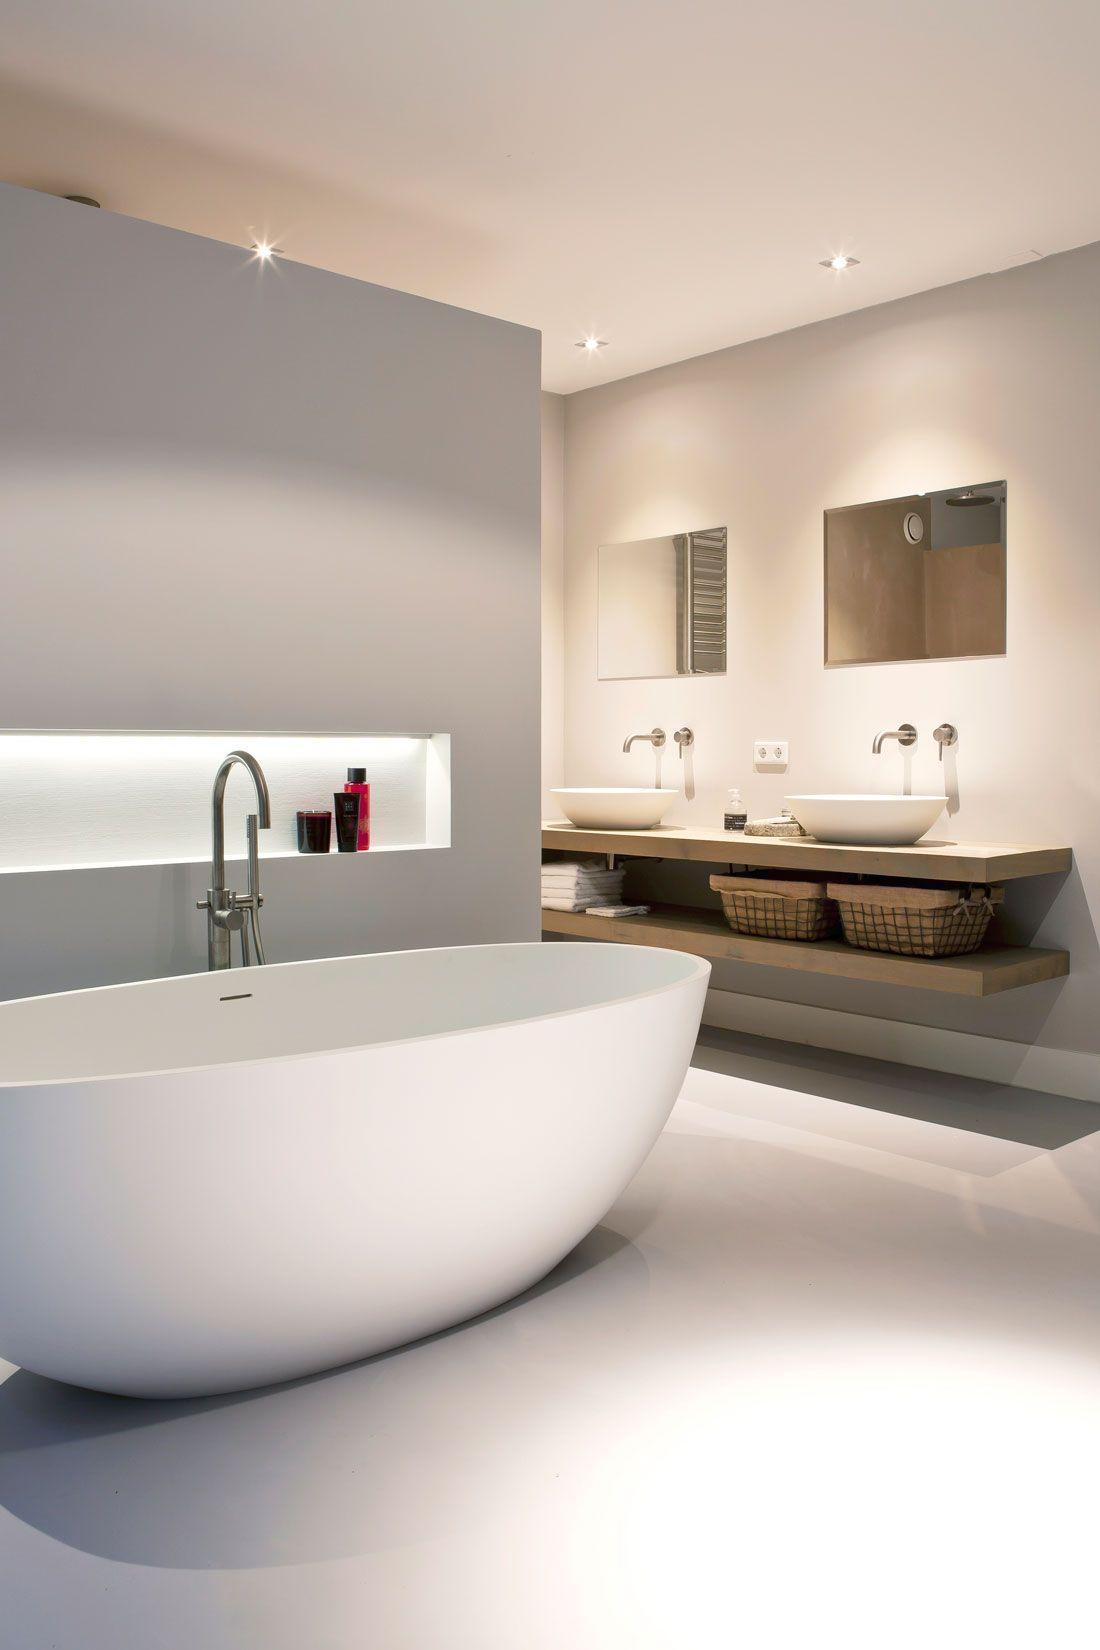 Aufteilung Badezimmer Badkamer Modern Design Badkamer Badkamer Inrichting